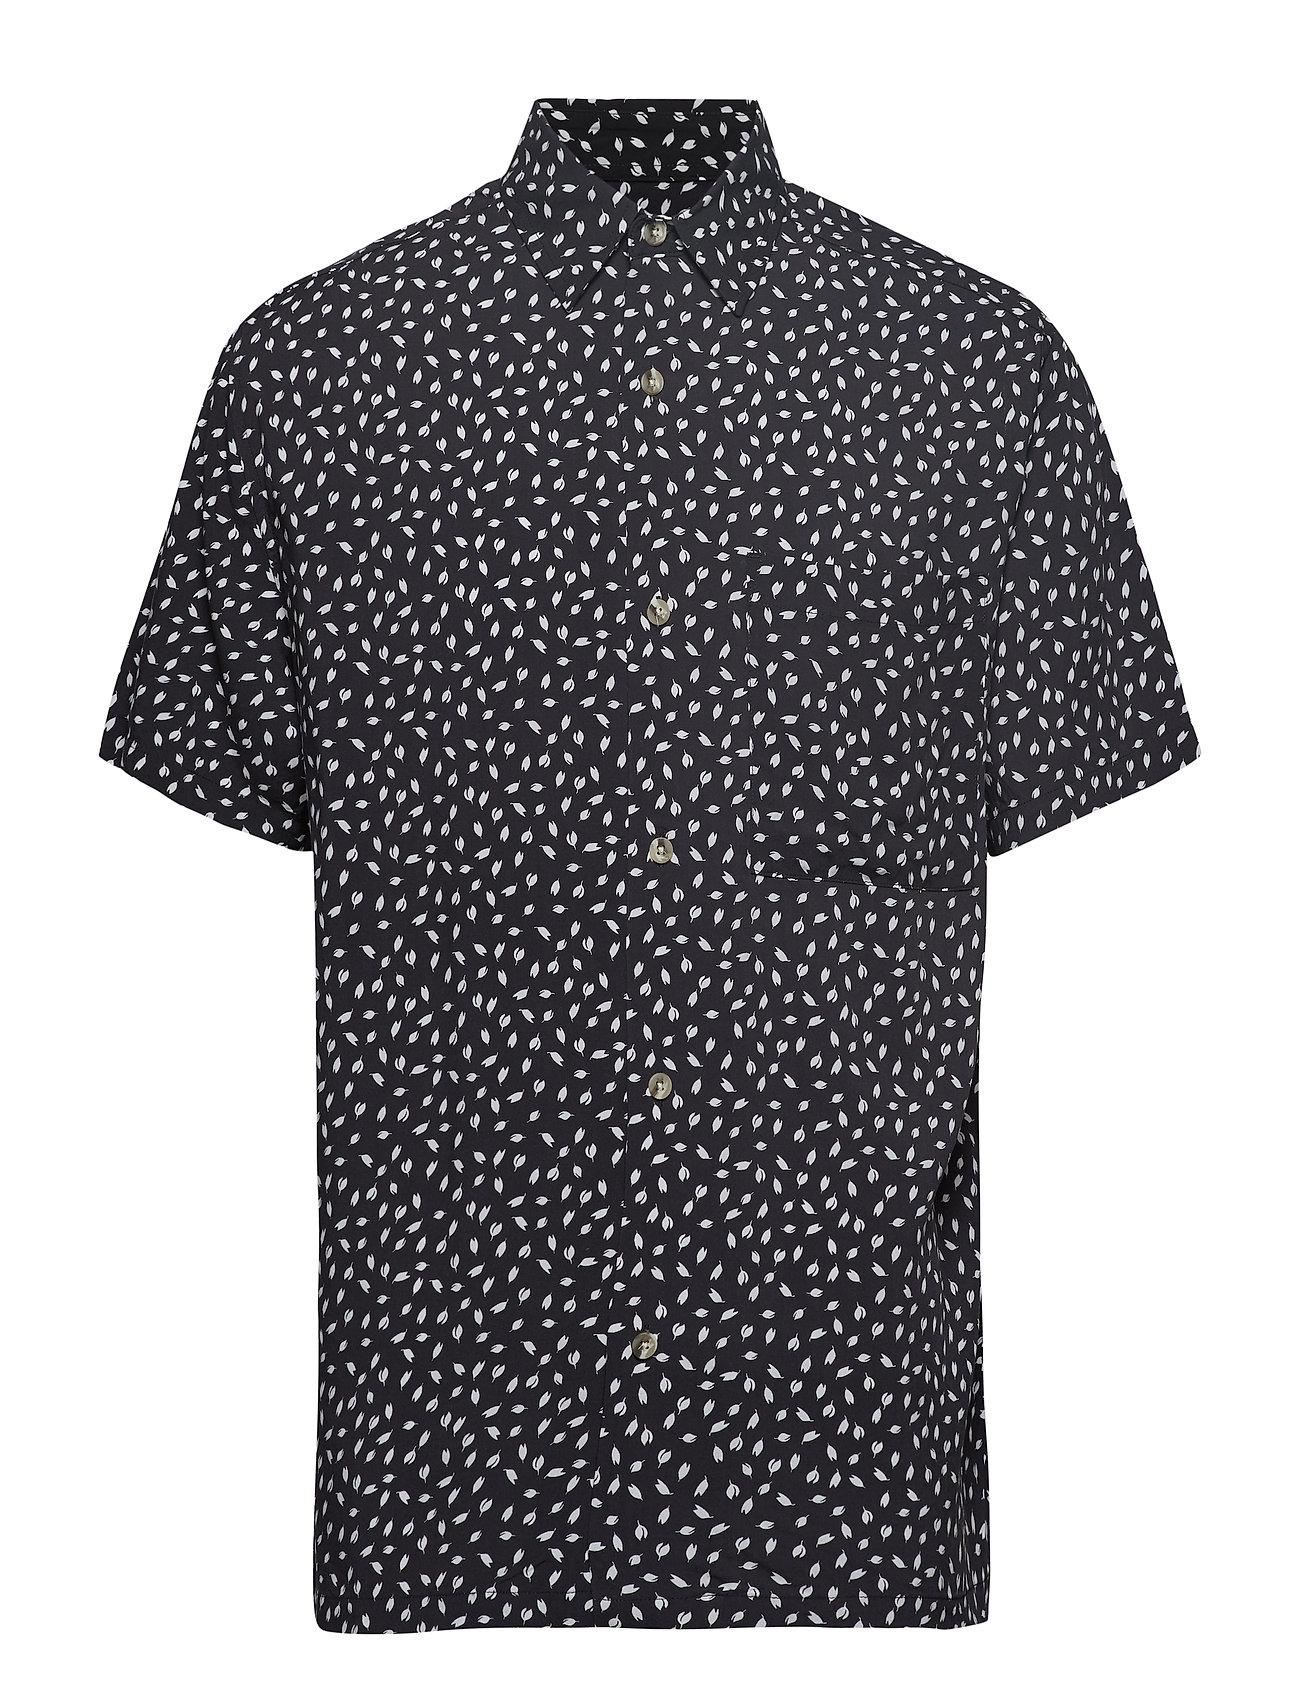 NEUW Smiths SS Shirt - BLACK